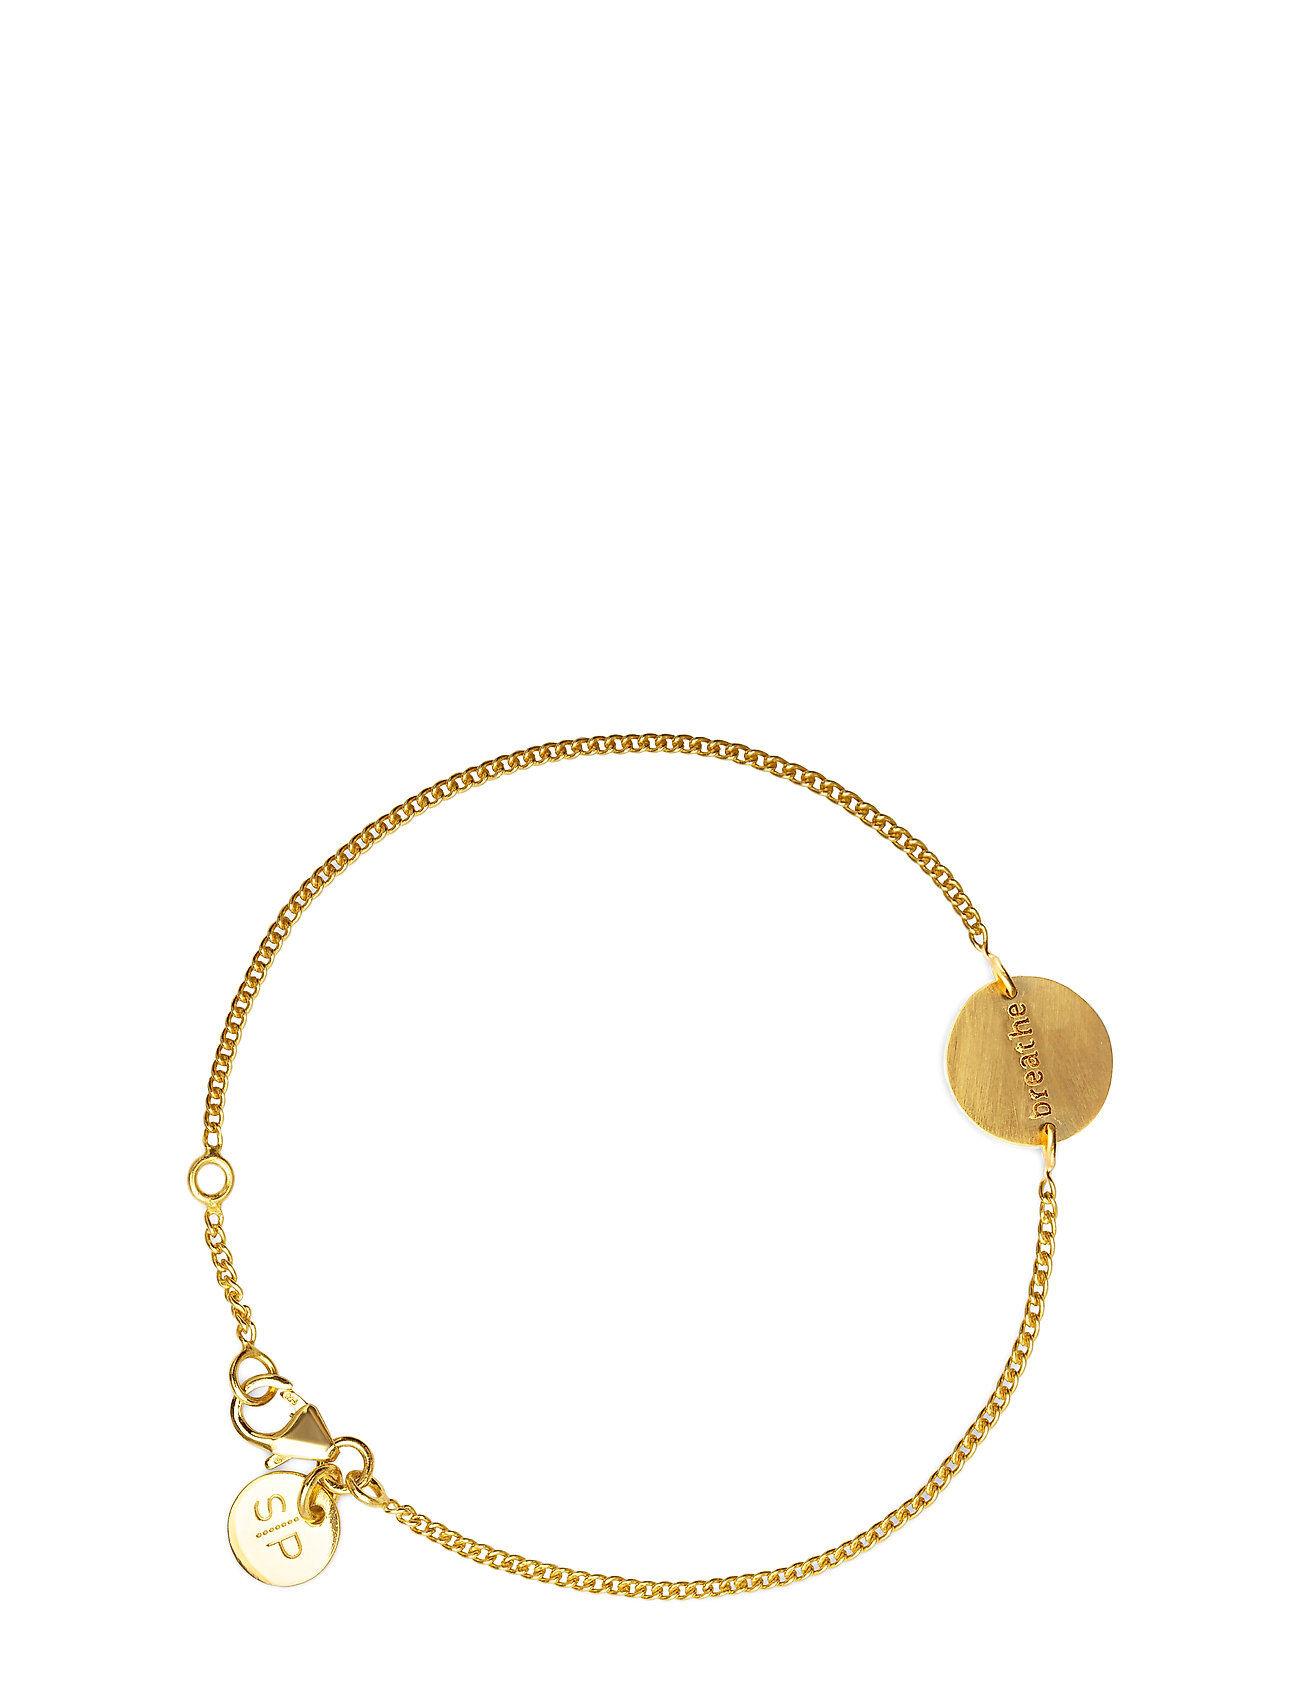 Syster P Minimalistica Breathe Bracelet Gold